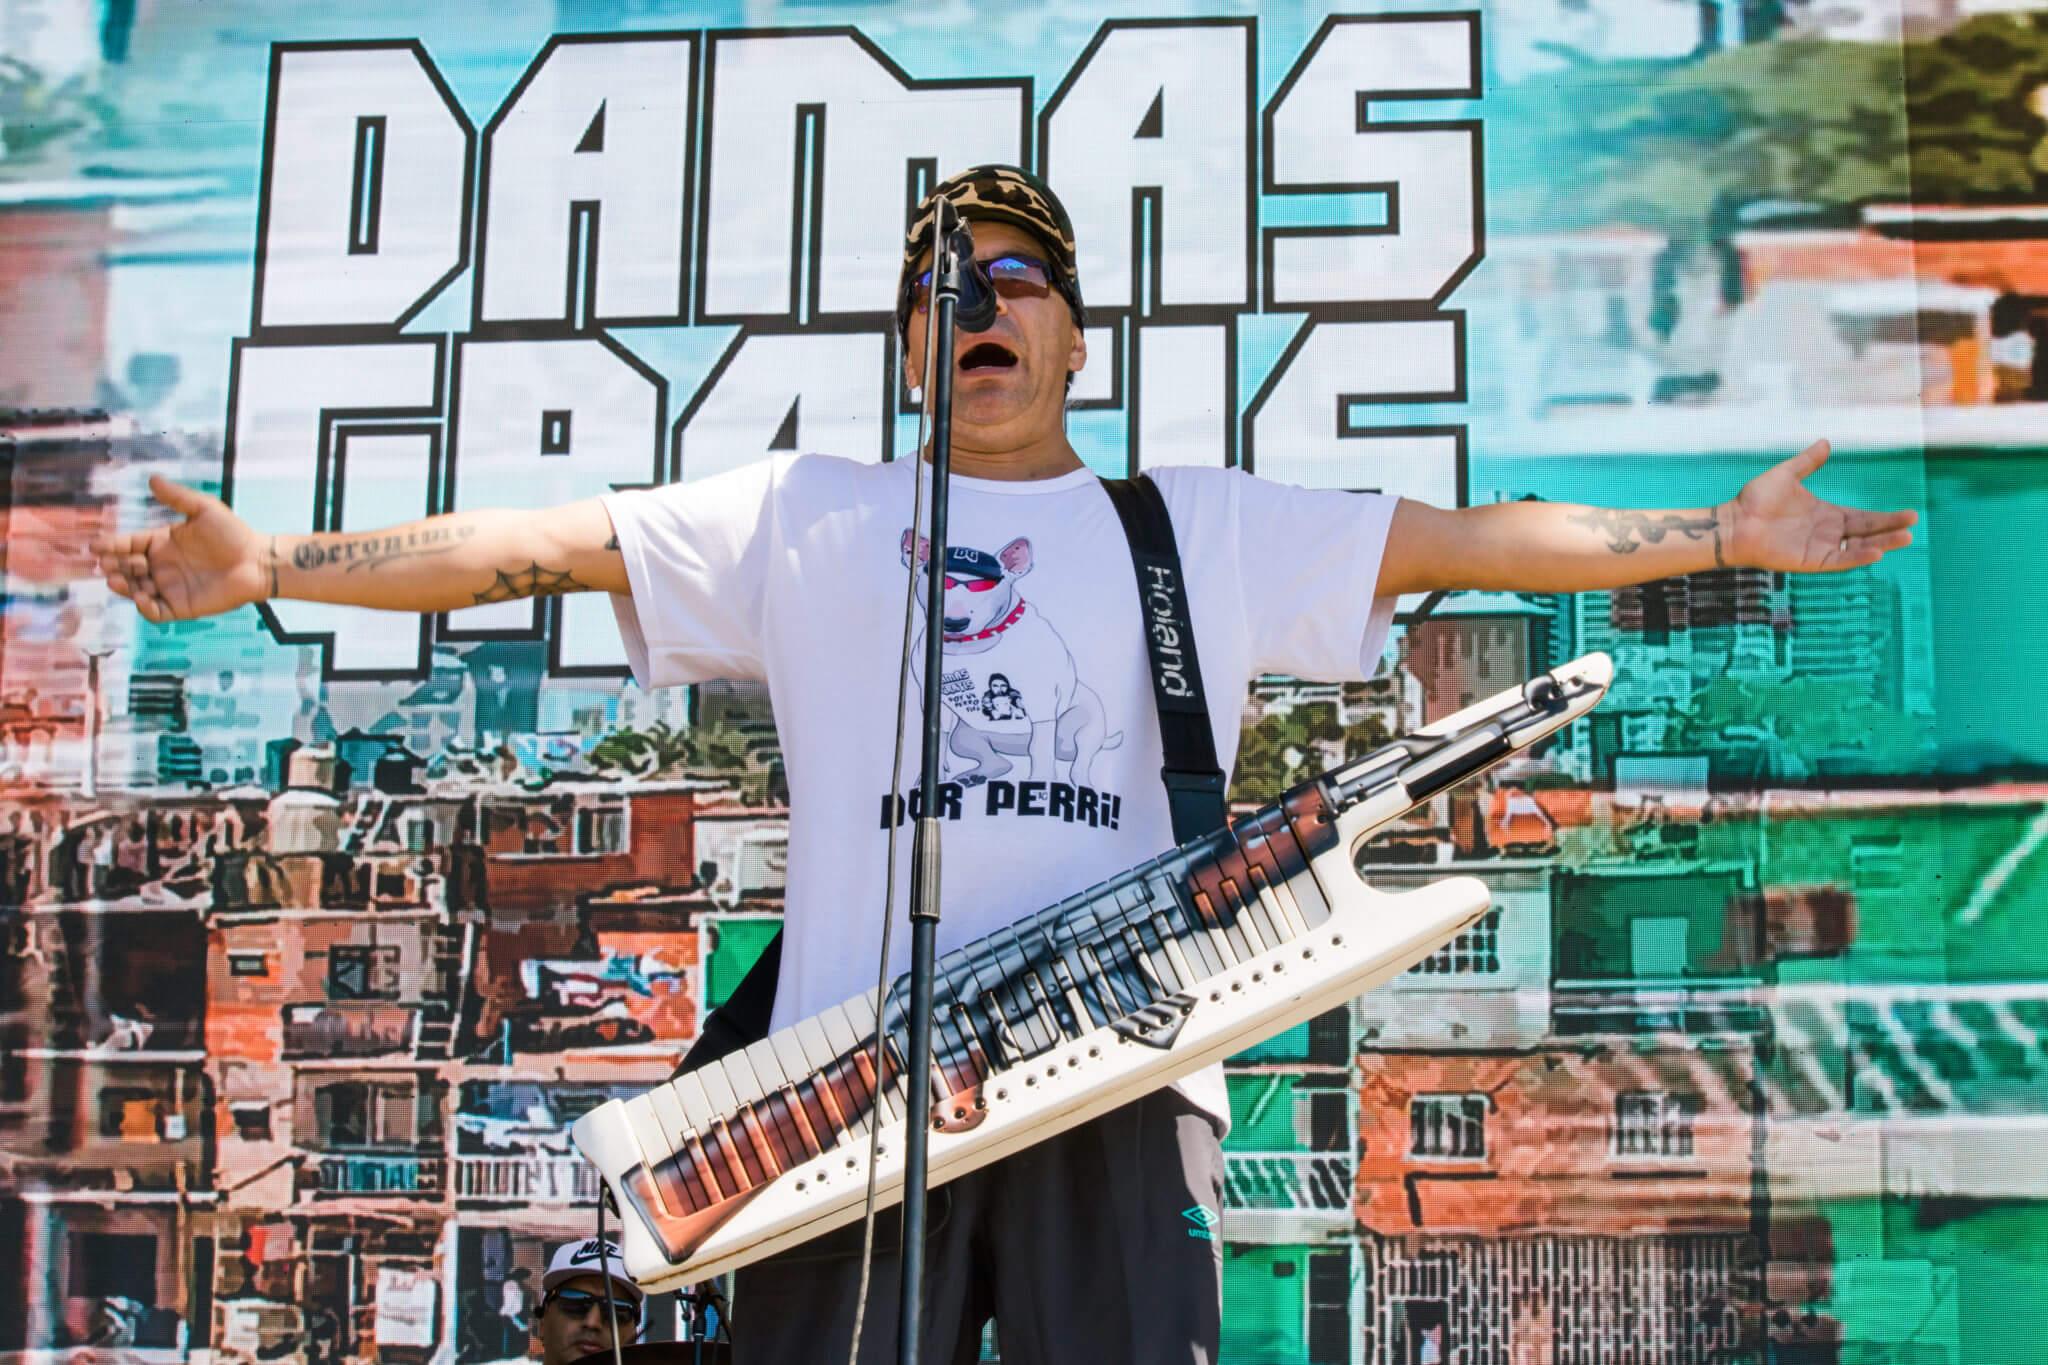 Damas Gratis @ Lollapalooza Chile 2018. Fotografía: Lukas Cruzat para mor.bo